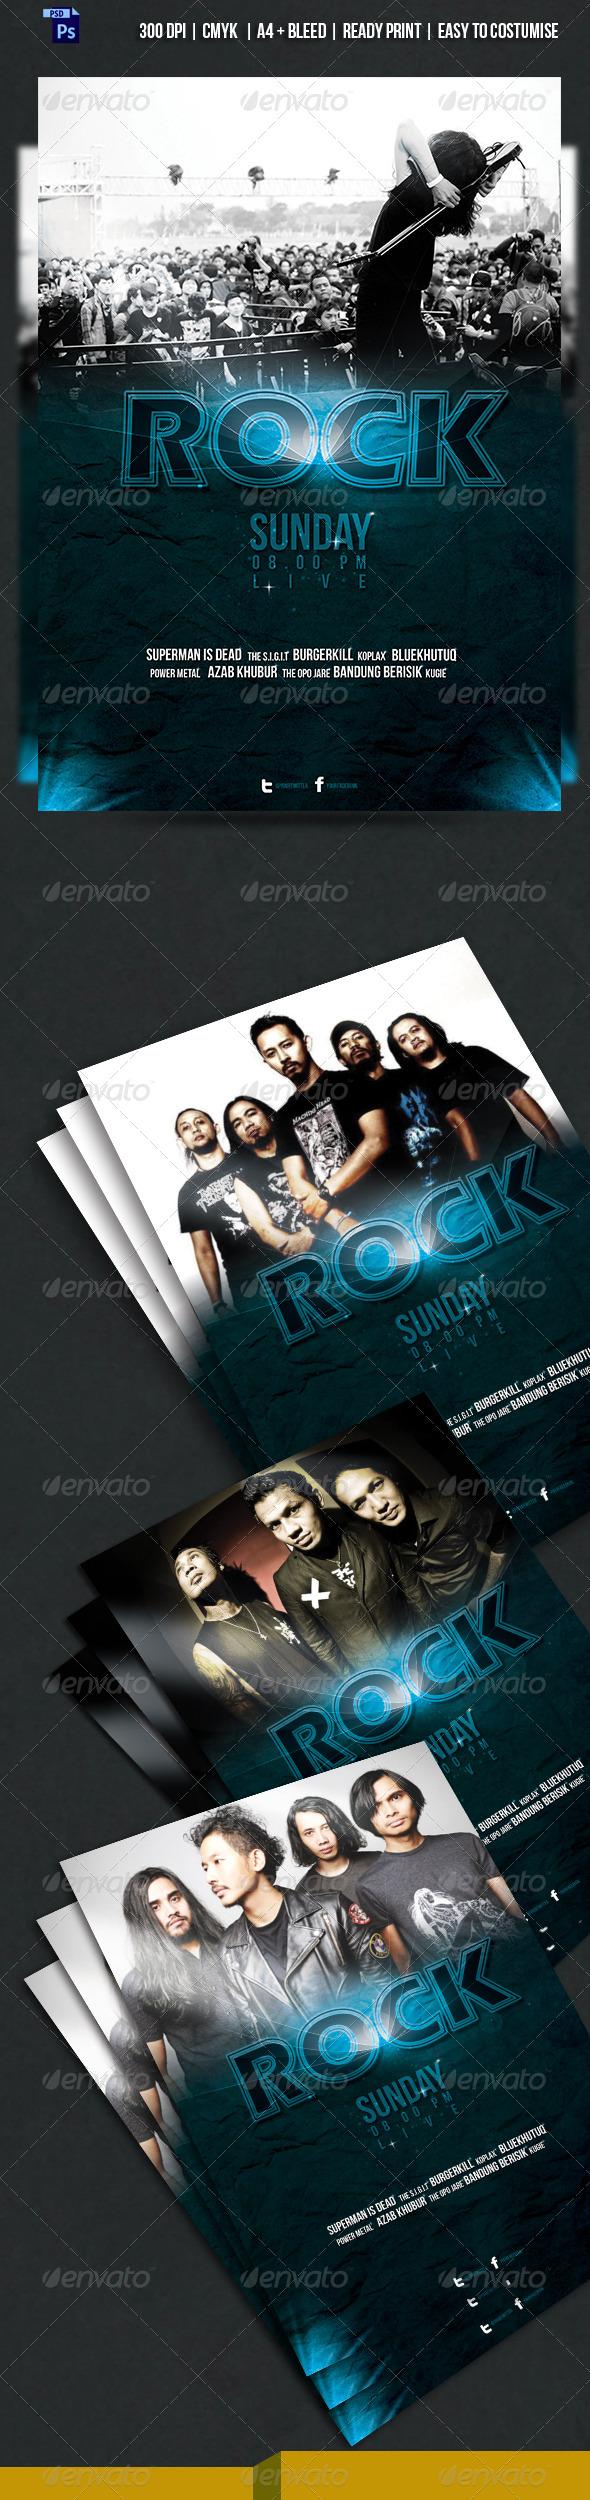 GraphicRiver KOPLAX Rock Band Concert Flyer 6680437